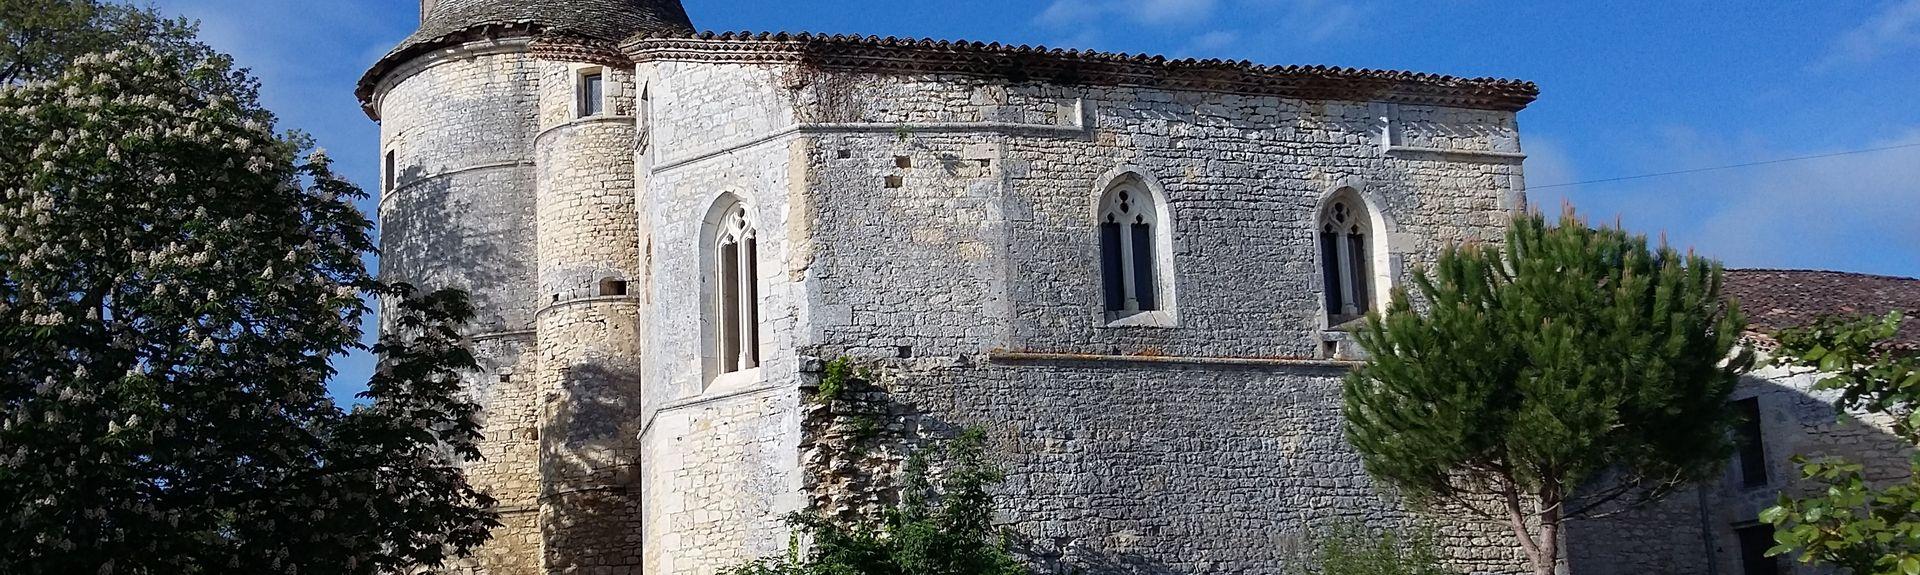 Maubec, Tarn i Garonna, Tarn-et-Garonne, Francja